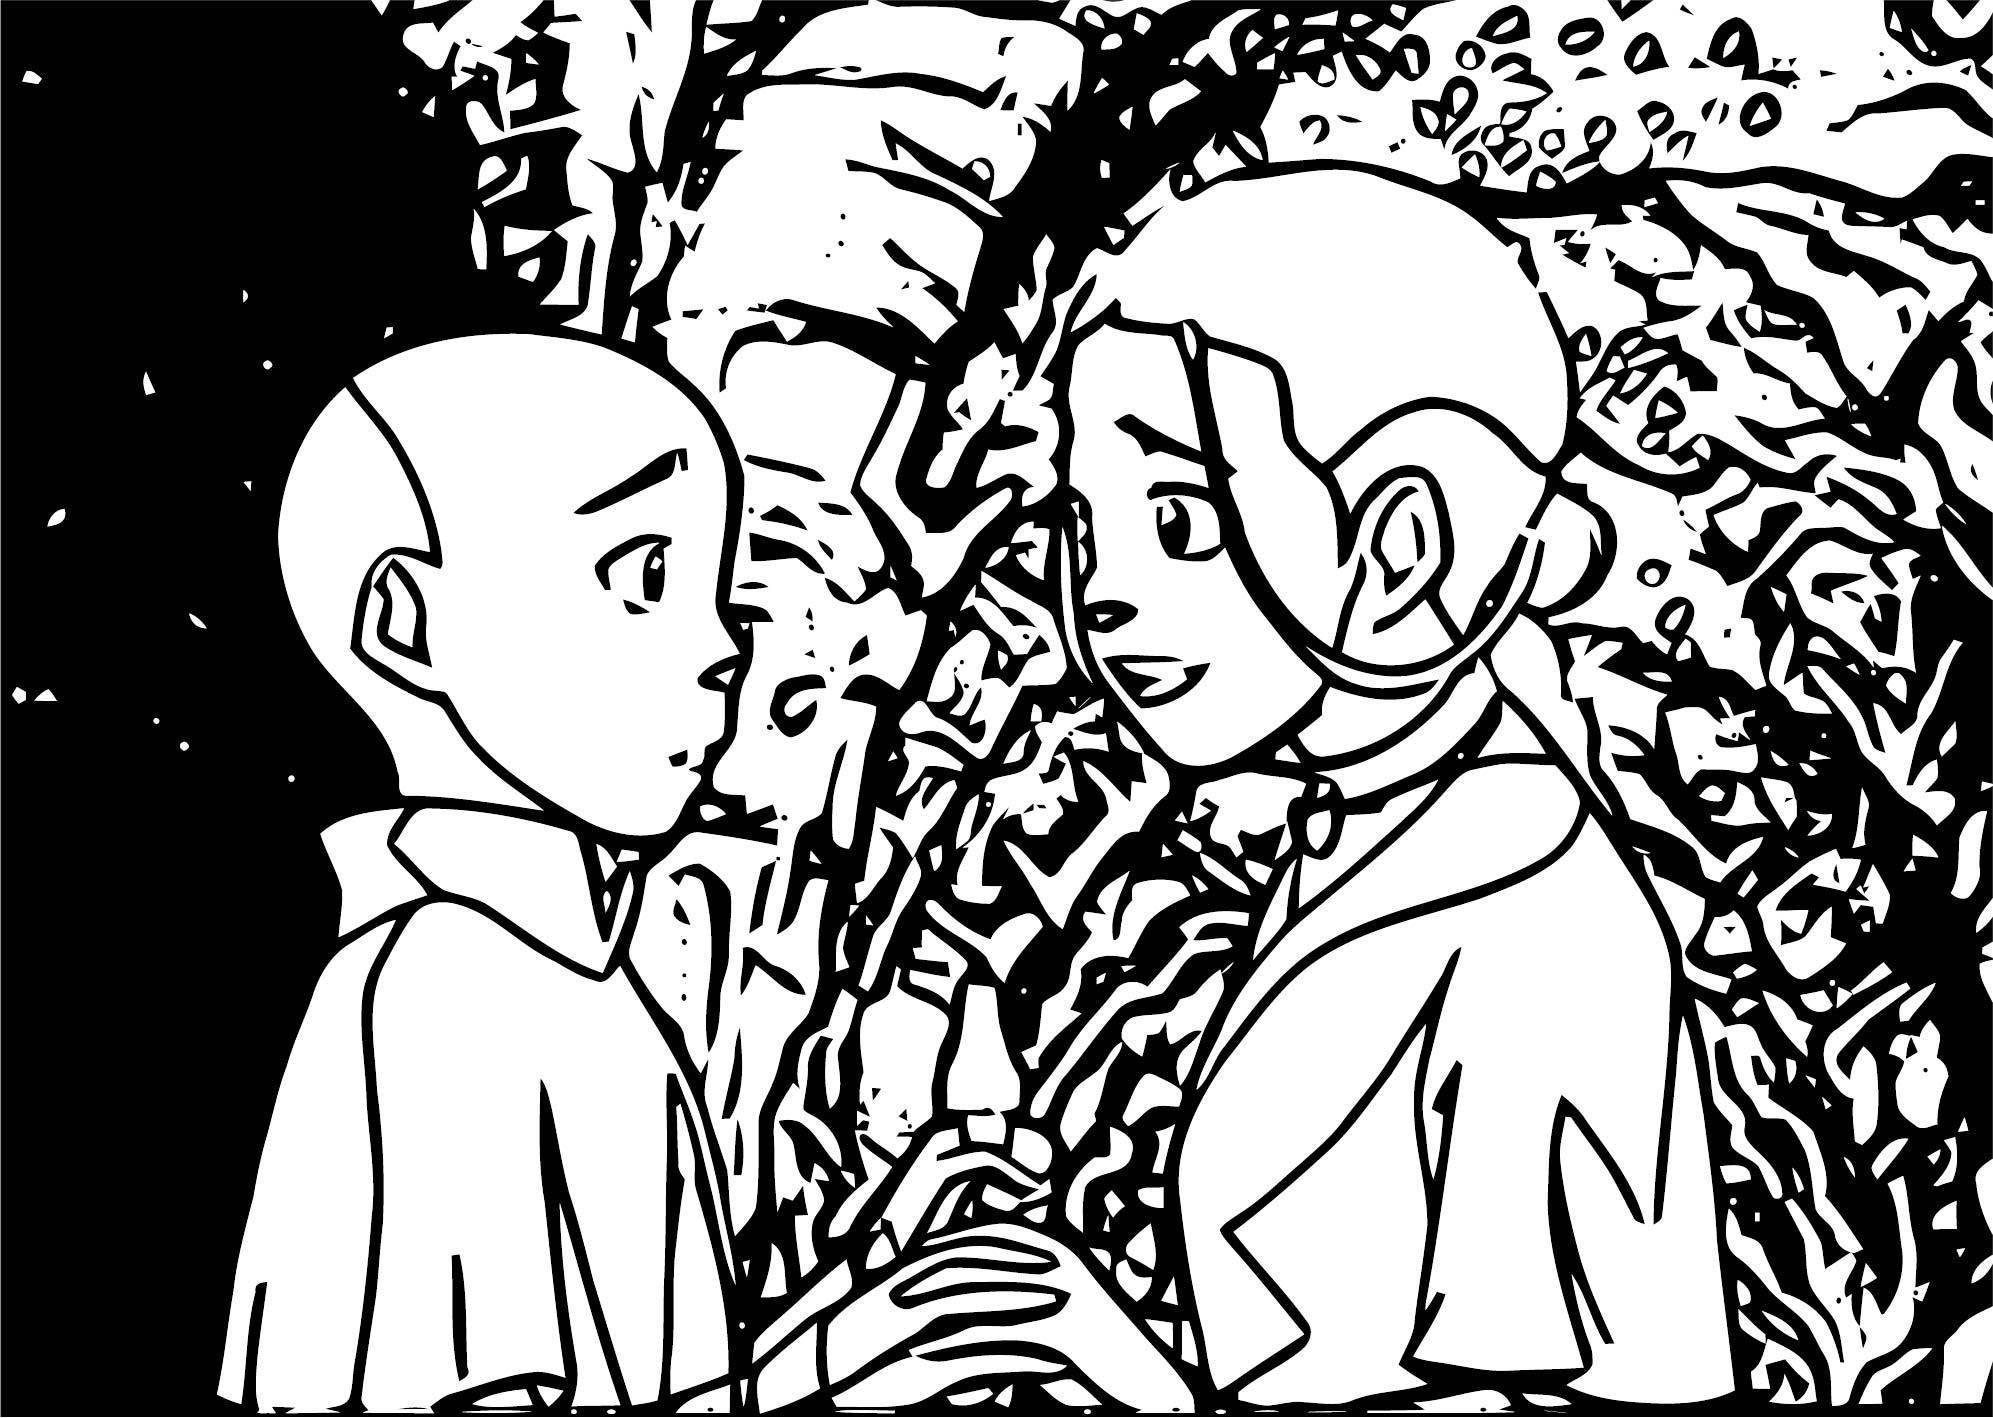 Tumblr MalrhUOrwqqqo Avatar Aang Coloring Page